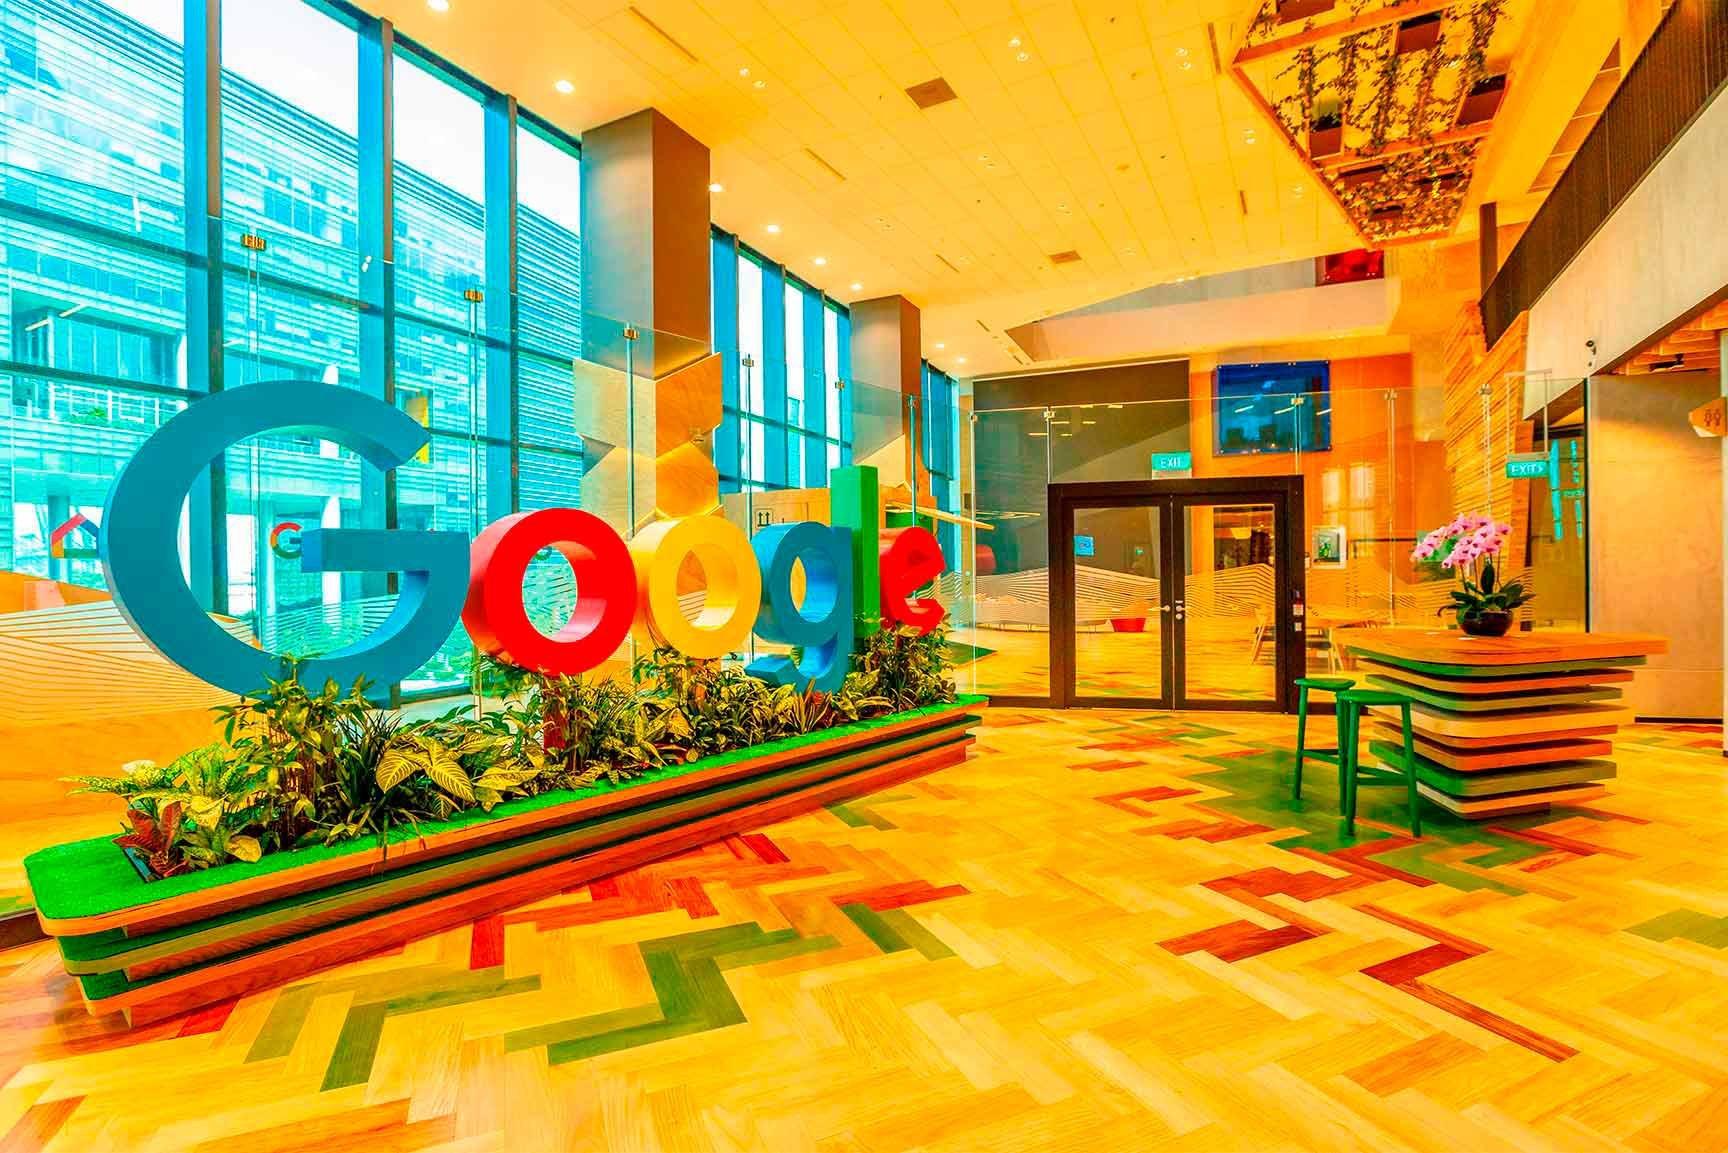 h_google-1.jpg